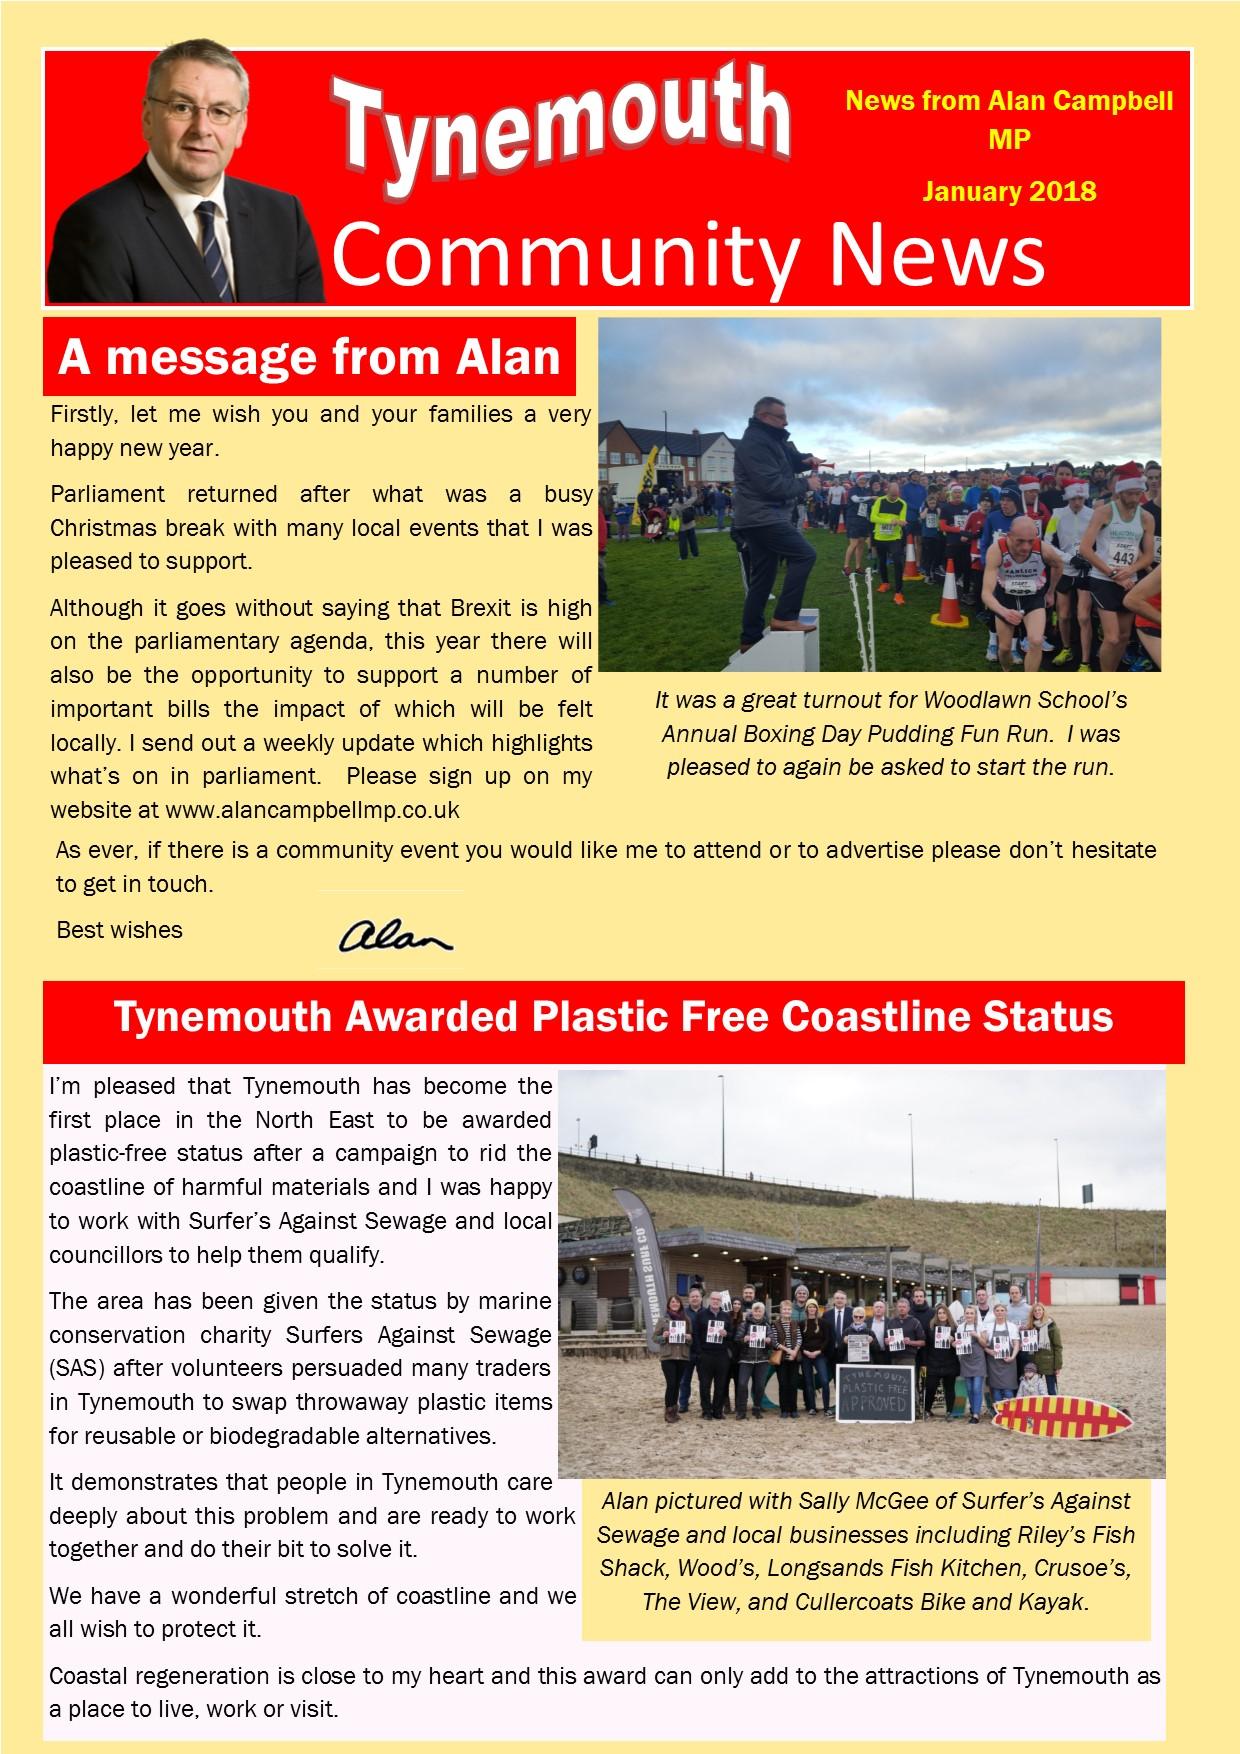 Alan_Campbell_MP_-__Community_News_-_Jan_2018.jpg